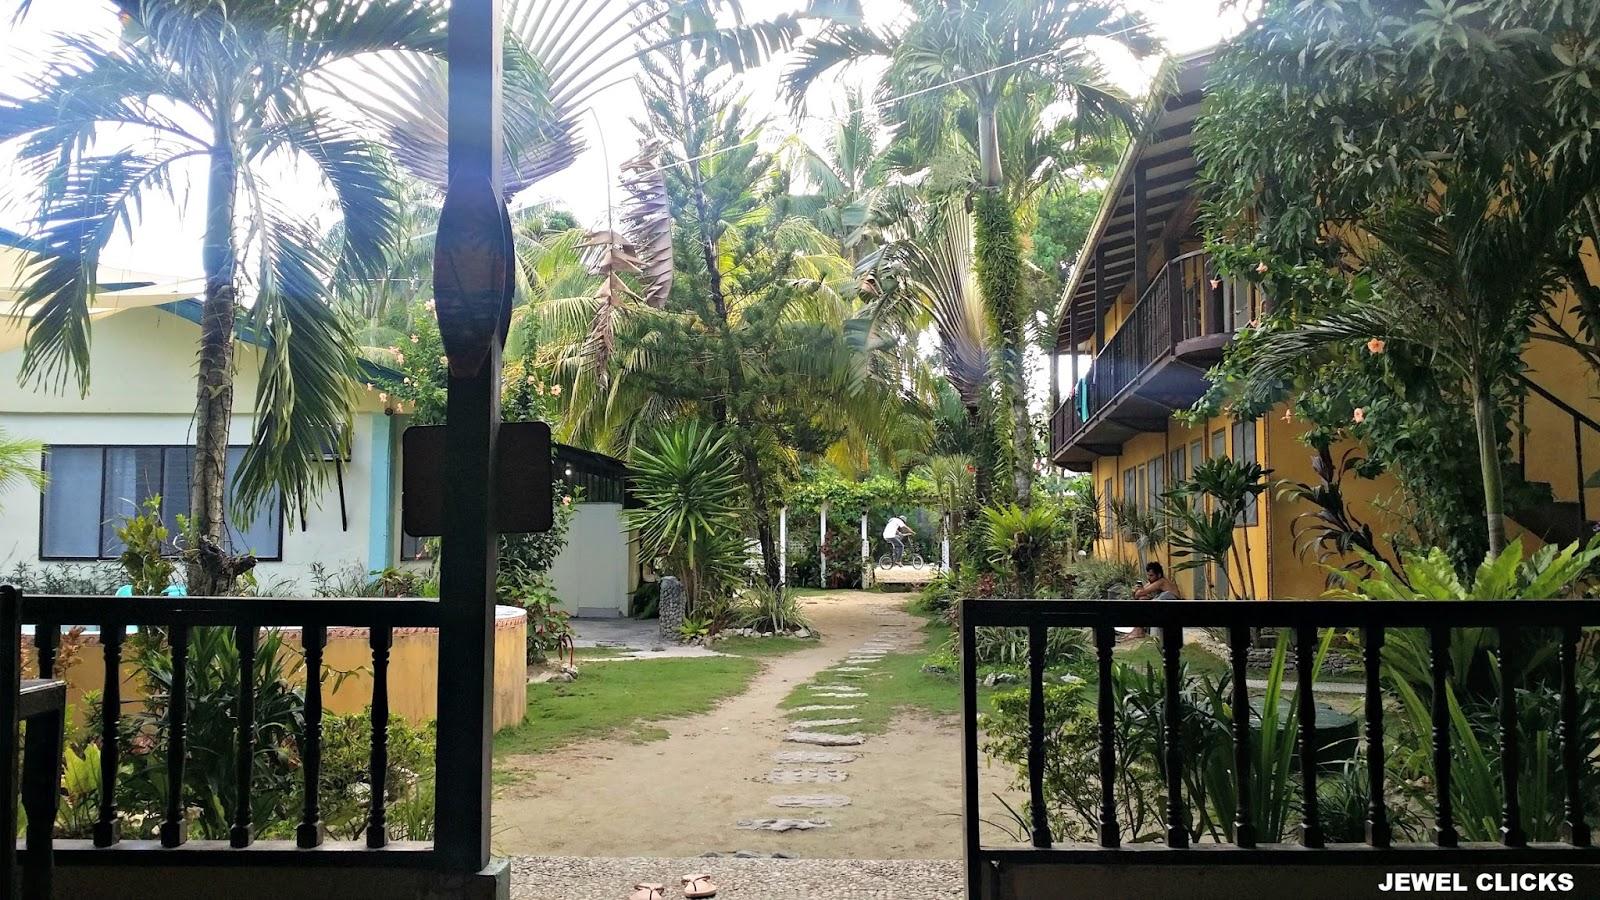 photo diary siargao island trip 2015 award winning photo